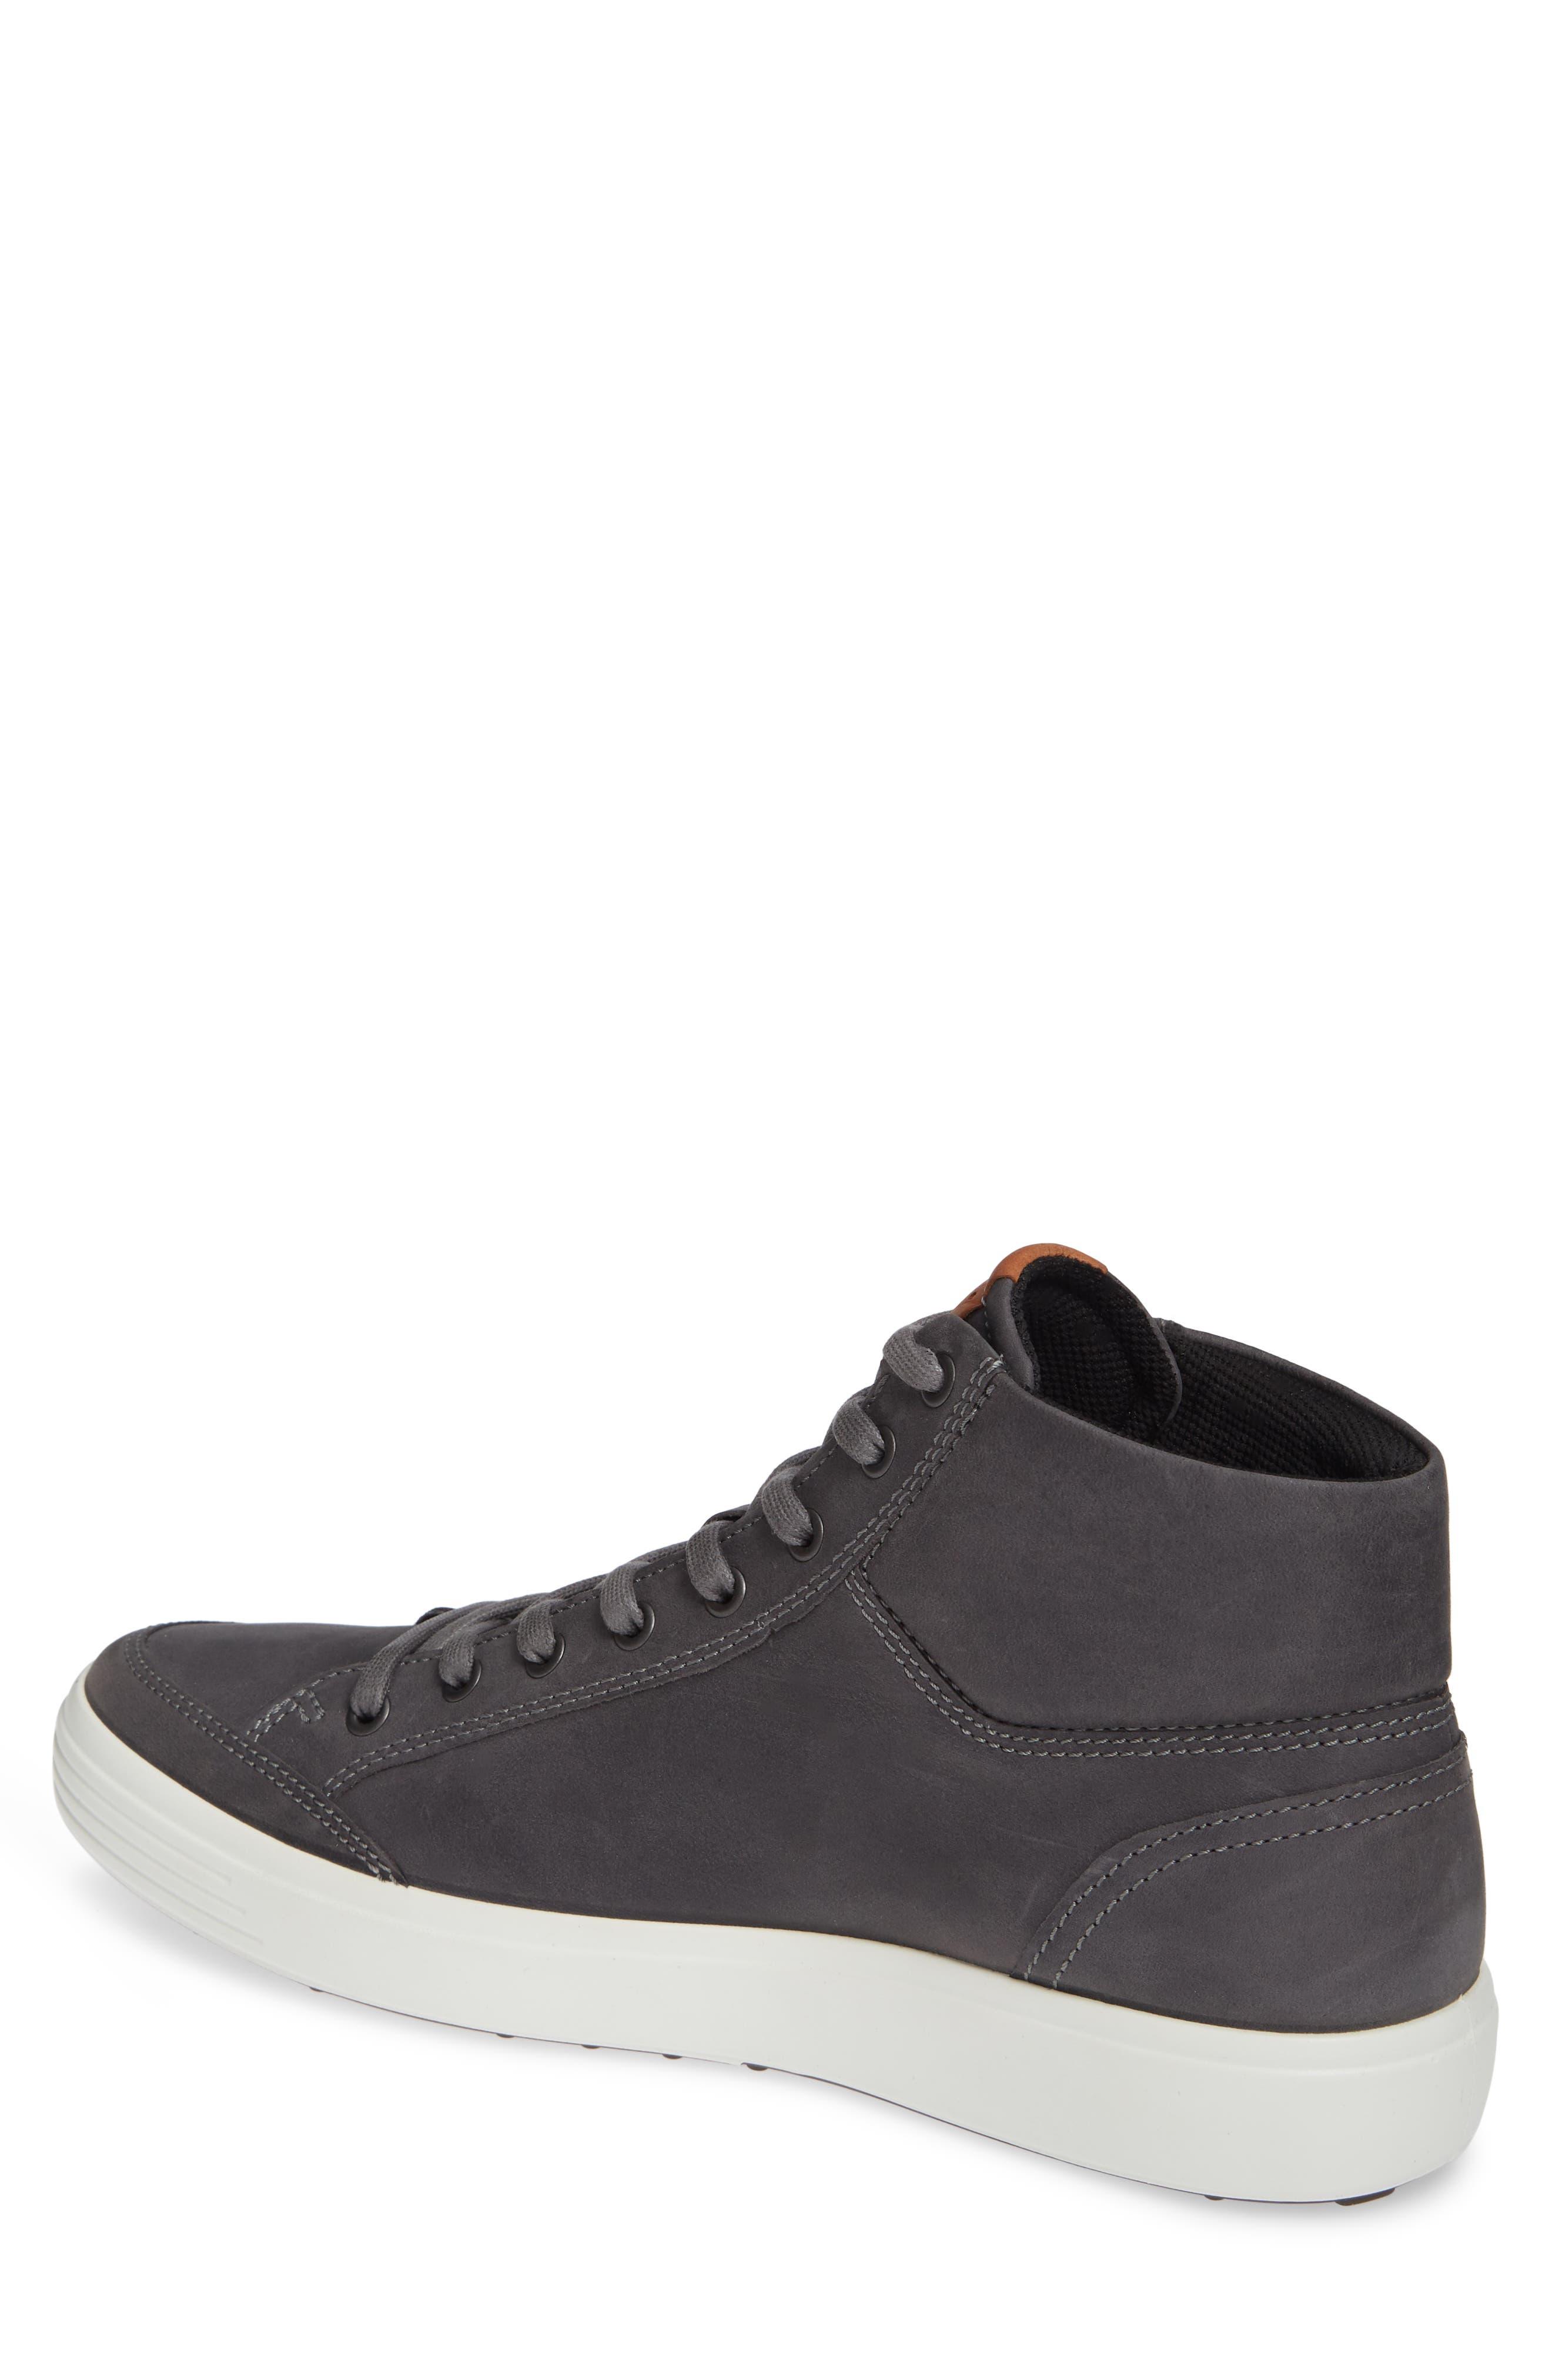 Soft 7 Sneaker,                             Alternate thumbnail 2, color,                             TITANIUM LEATHER